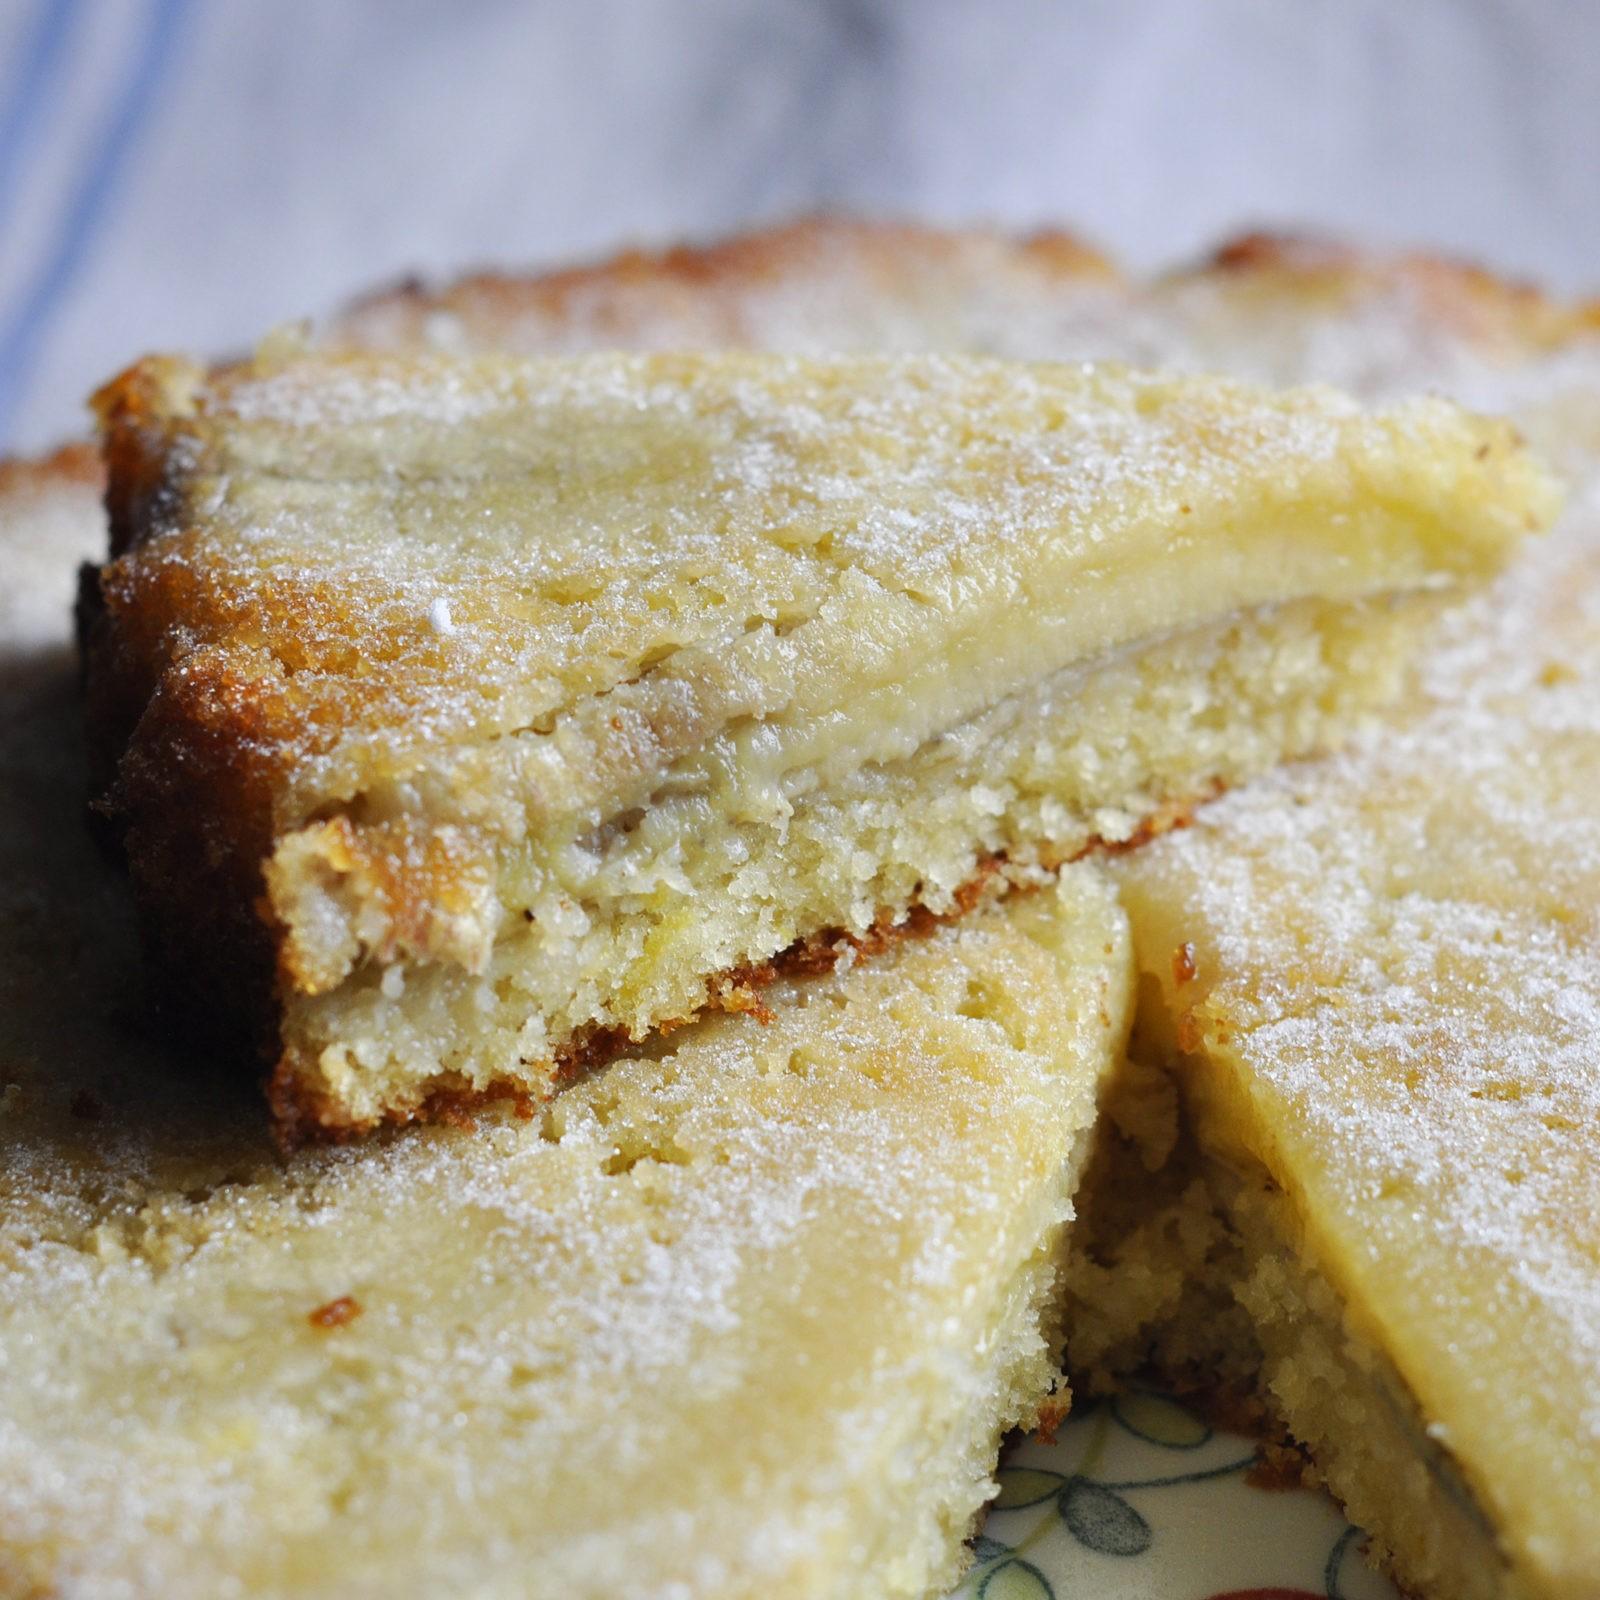 lacaccavella-magfood-mtc-torta-creola-banane-Cousine actuelle-Mar-3